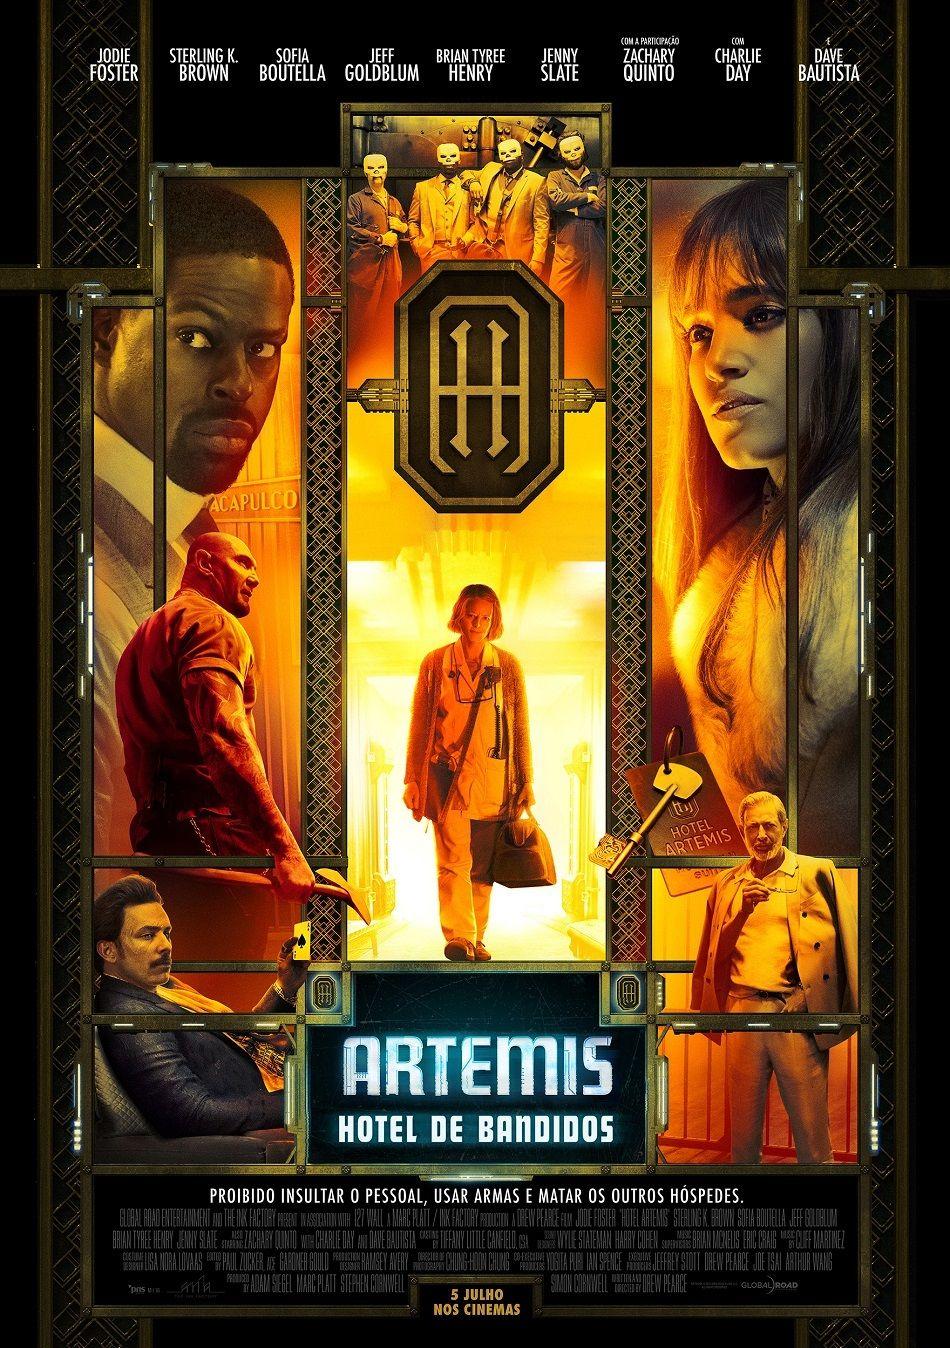 Artemis Hotel De Bandidos De Drew Pearce Dave Bautista Jodie Foster Sofia Boutella Sterling K Brown Full Movies Online Free Full Movies Online Artemis